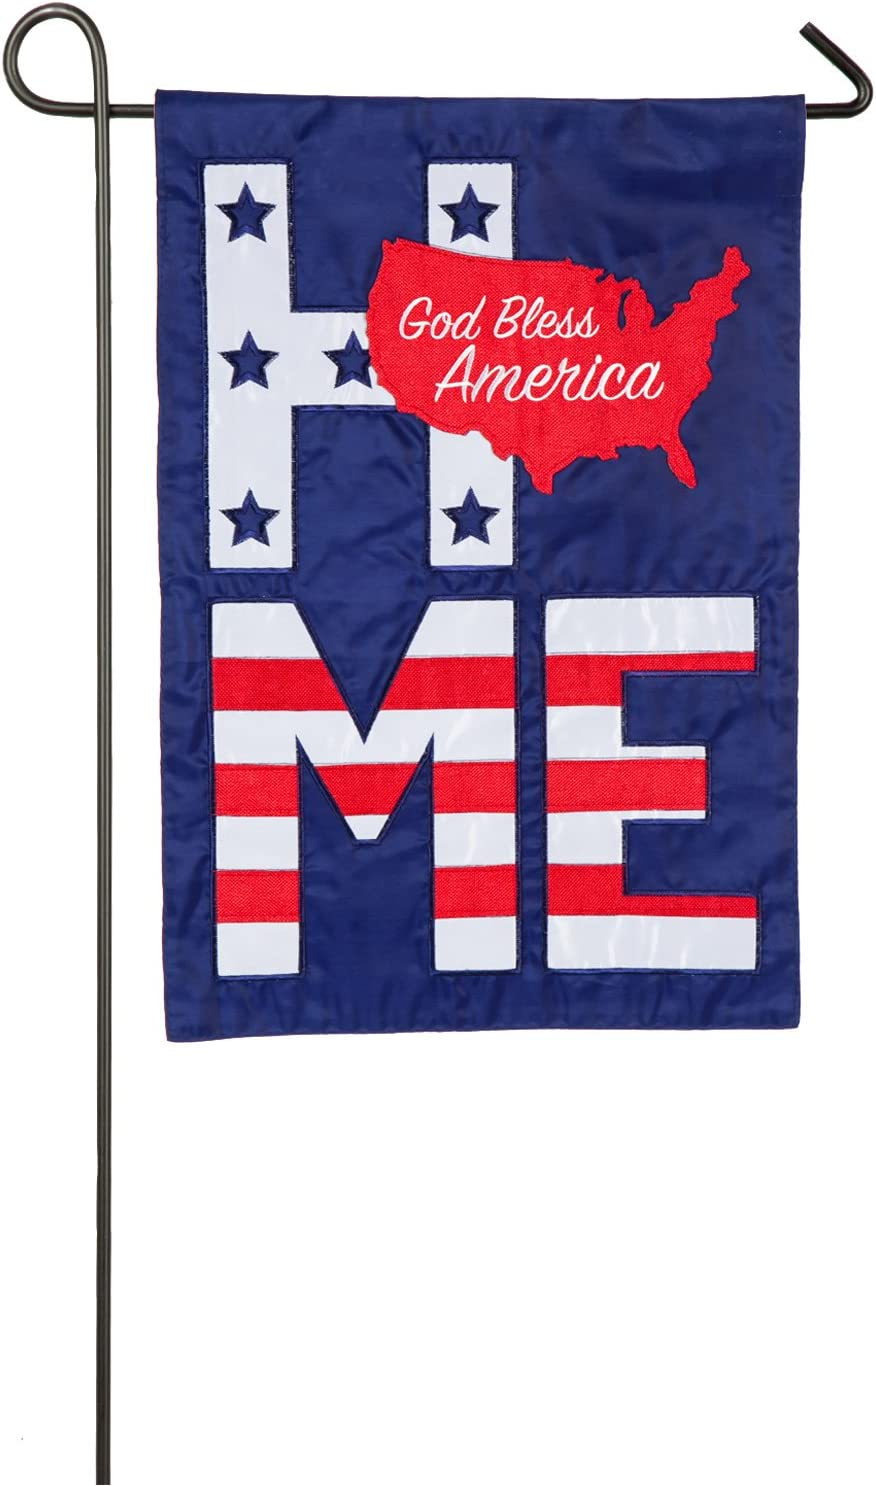 God Bless America Garden Applique Flag - 13 x 1 x 18 Inches